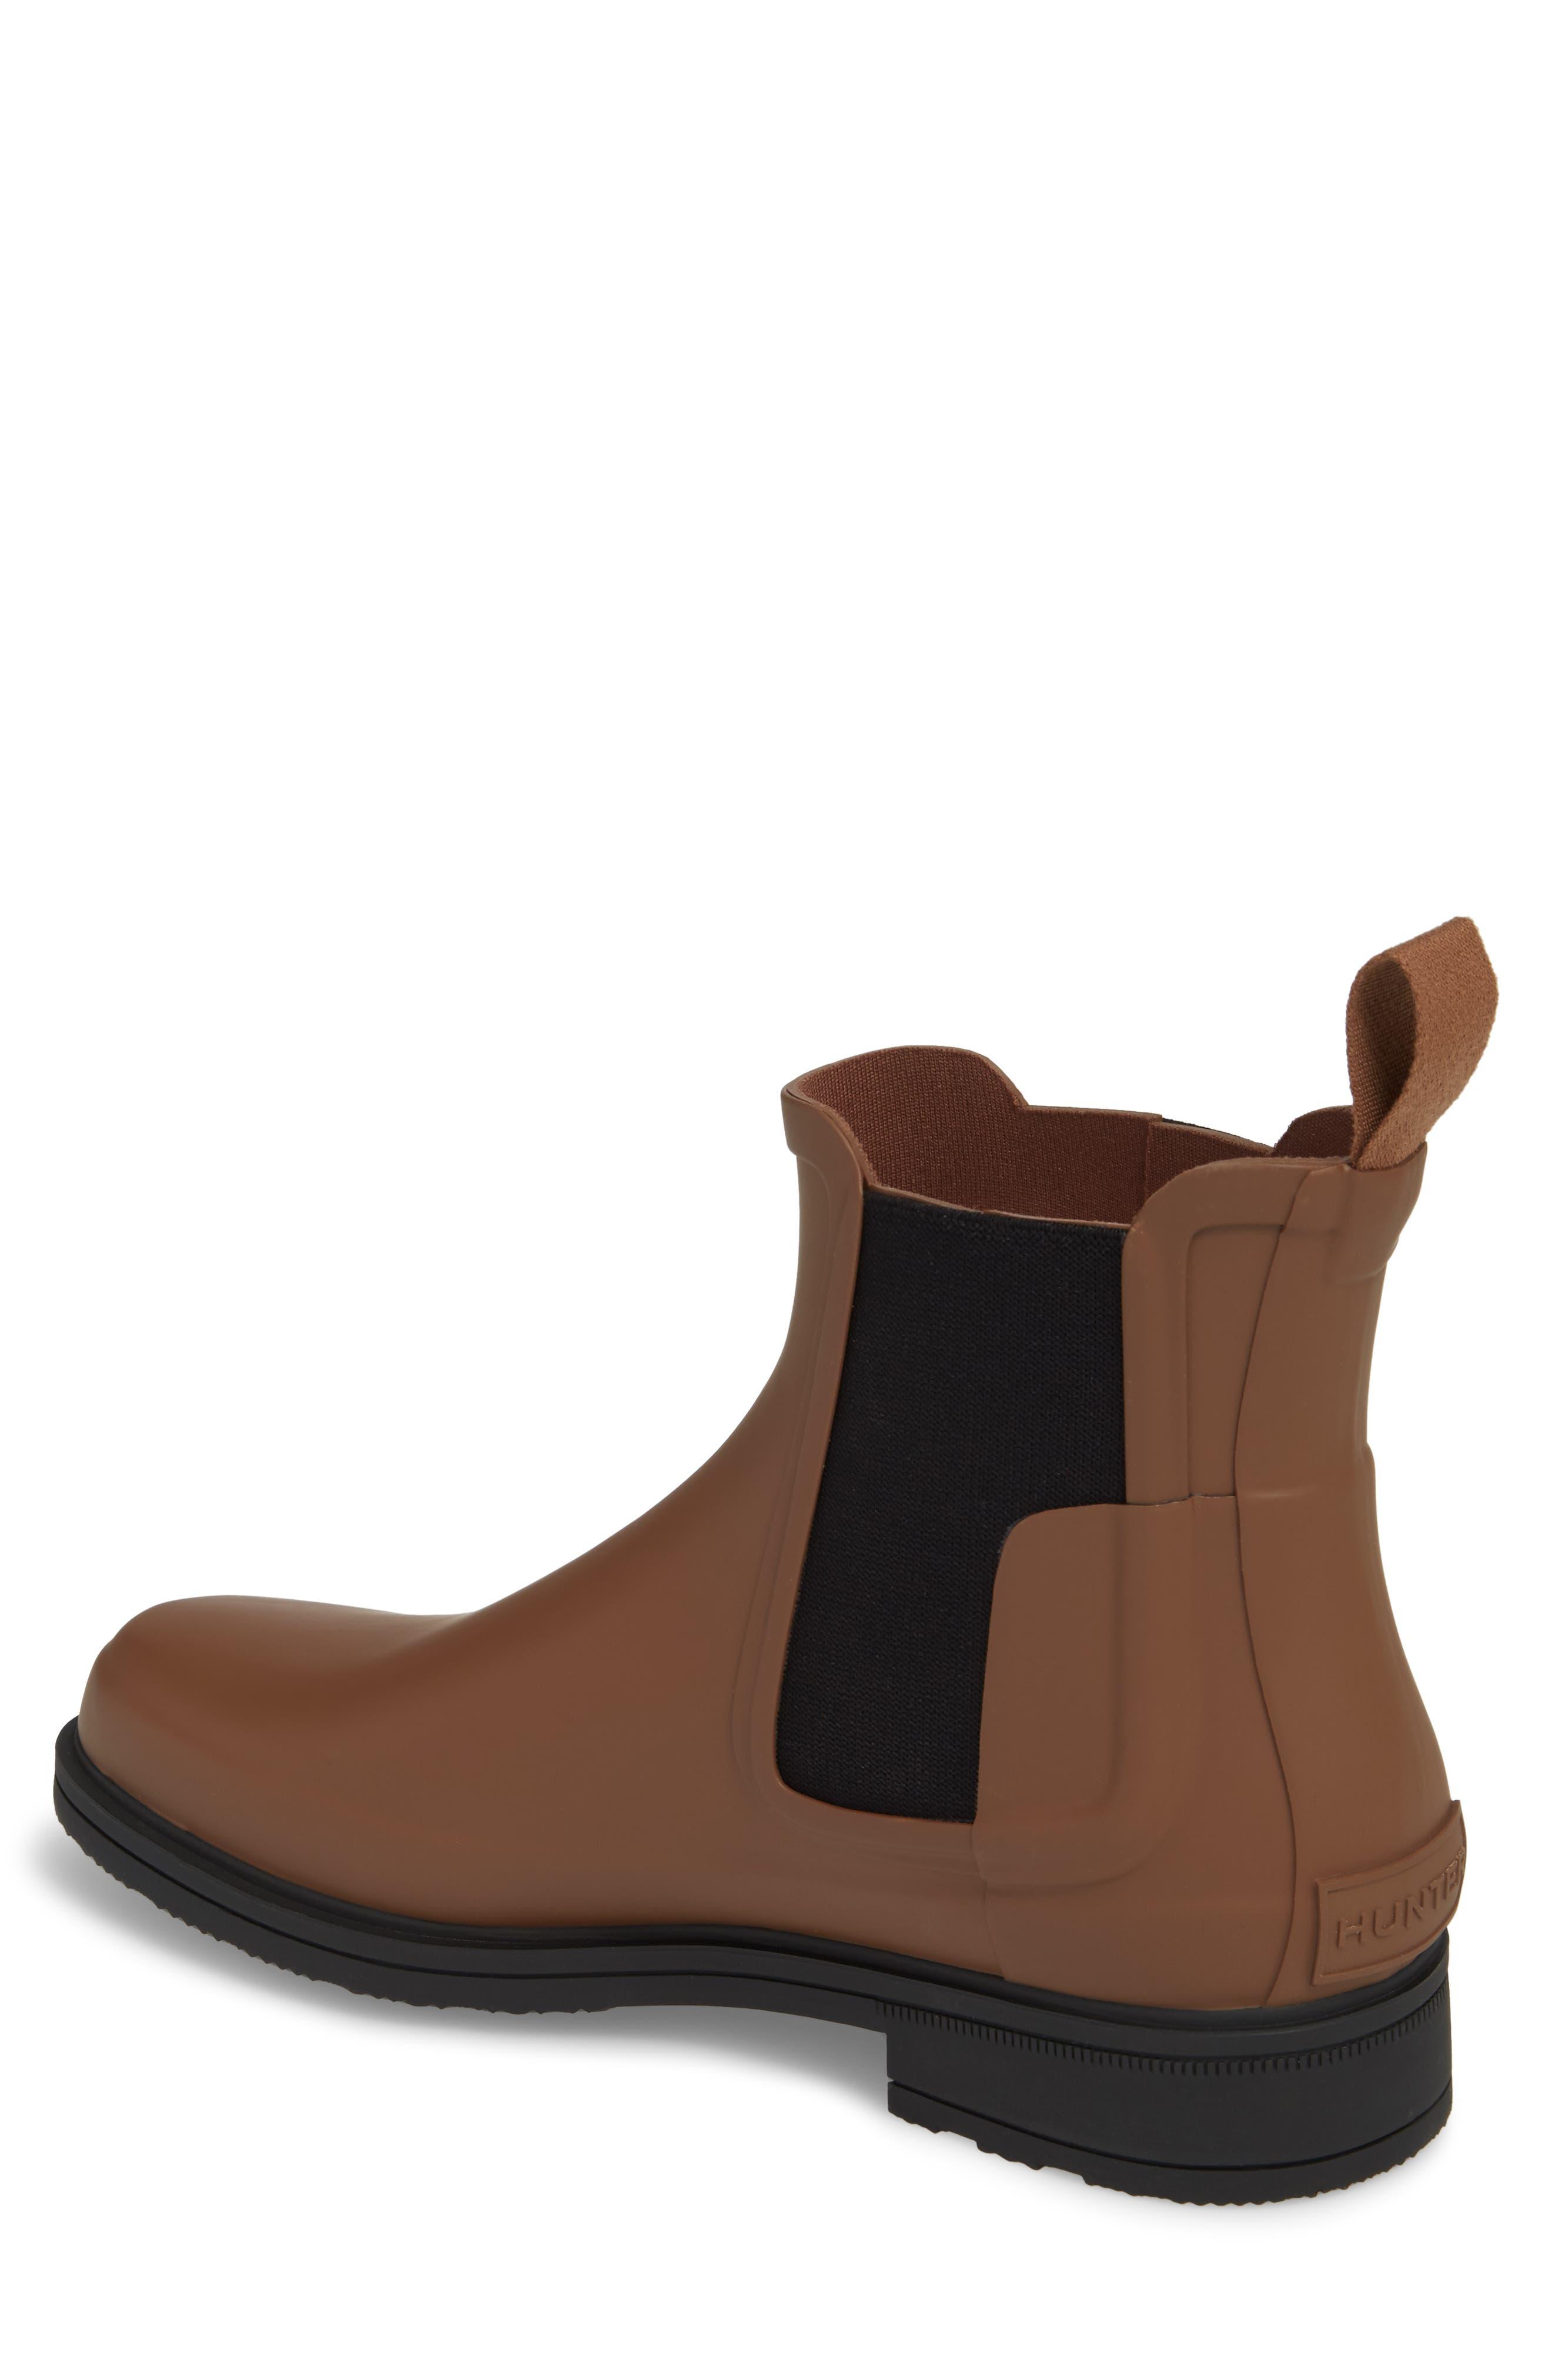 Alternate Image 2  - Hunter Original Refined Waterproof Chelsea Boot (Men)